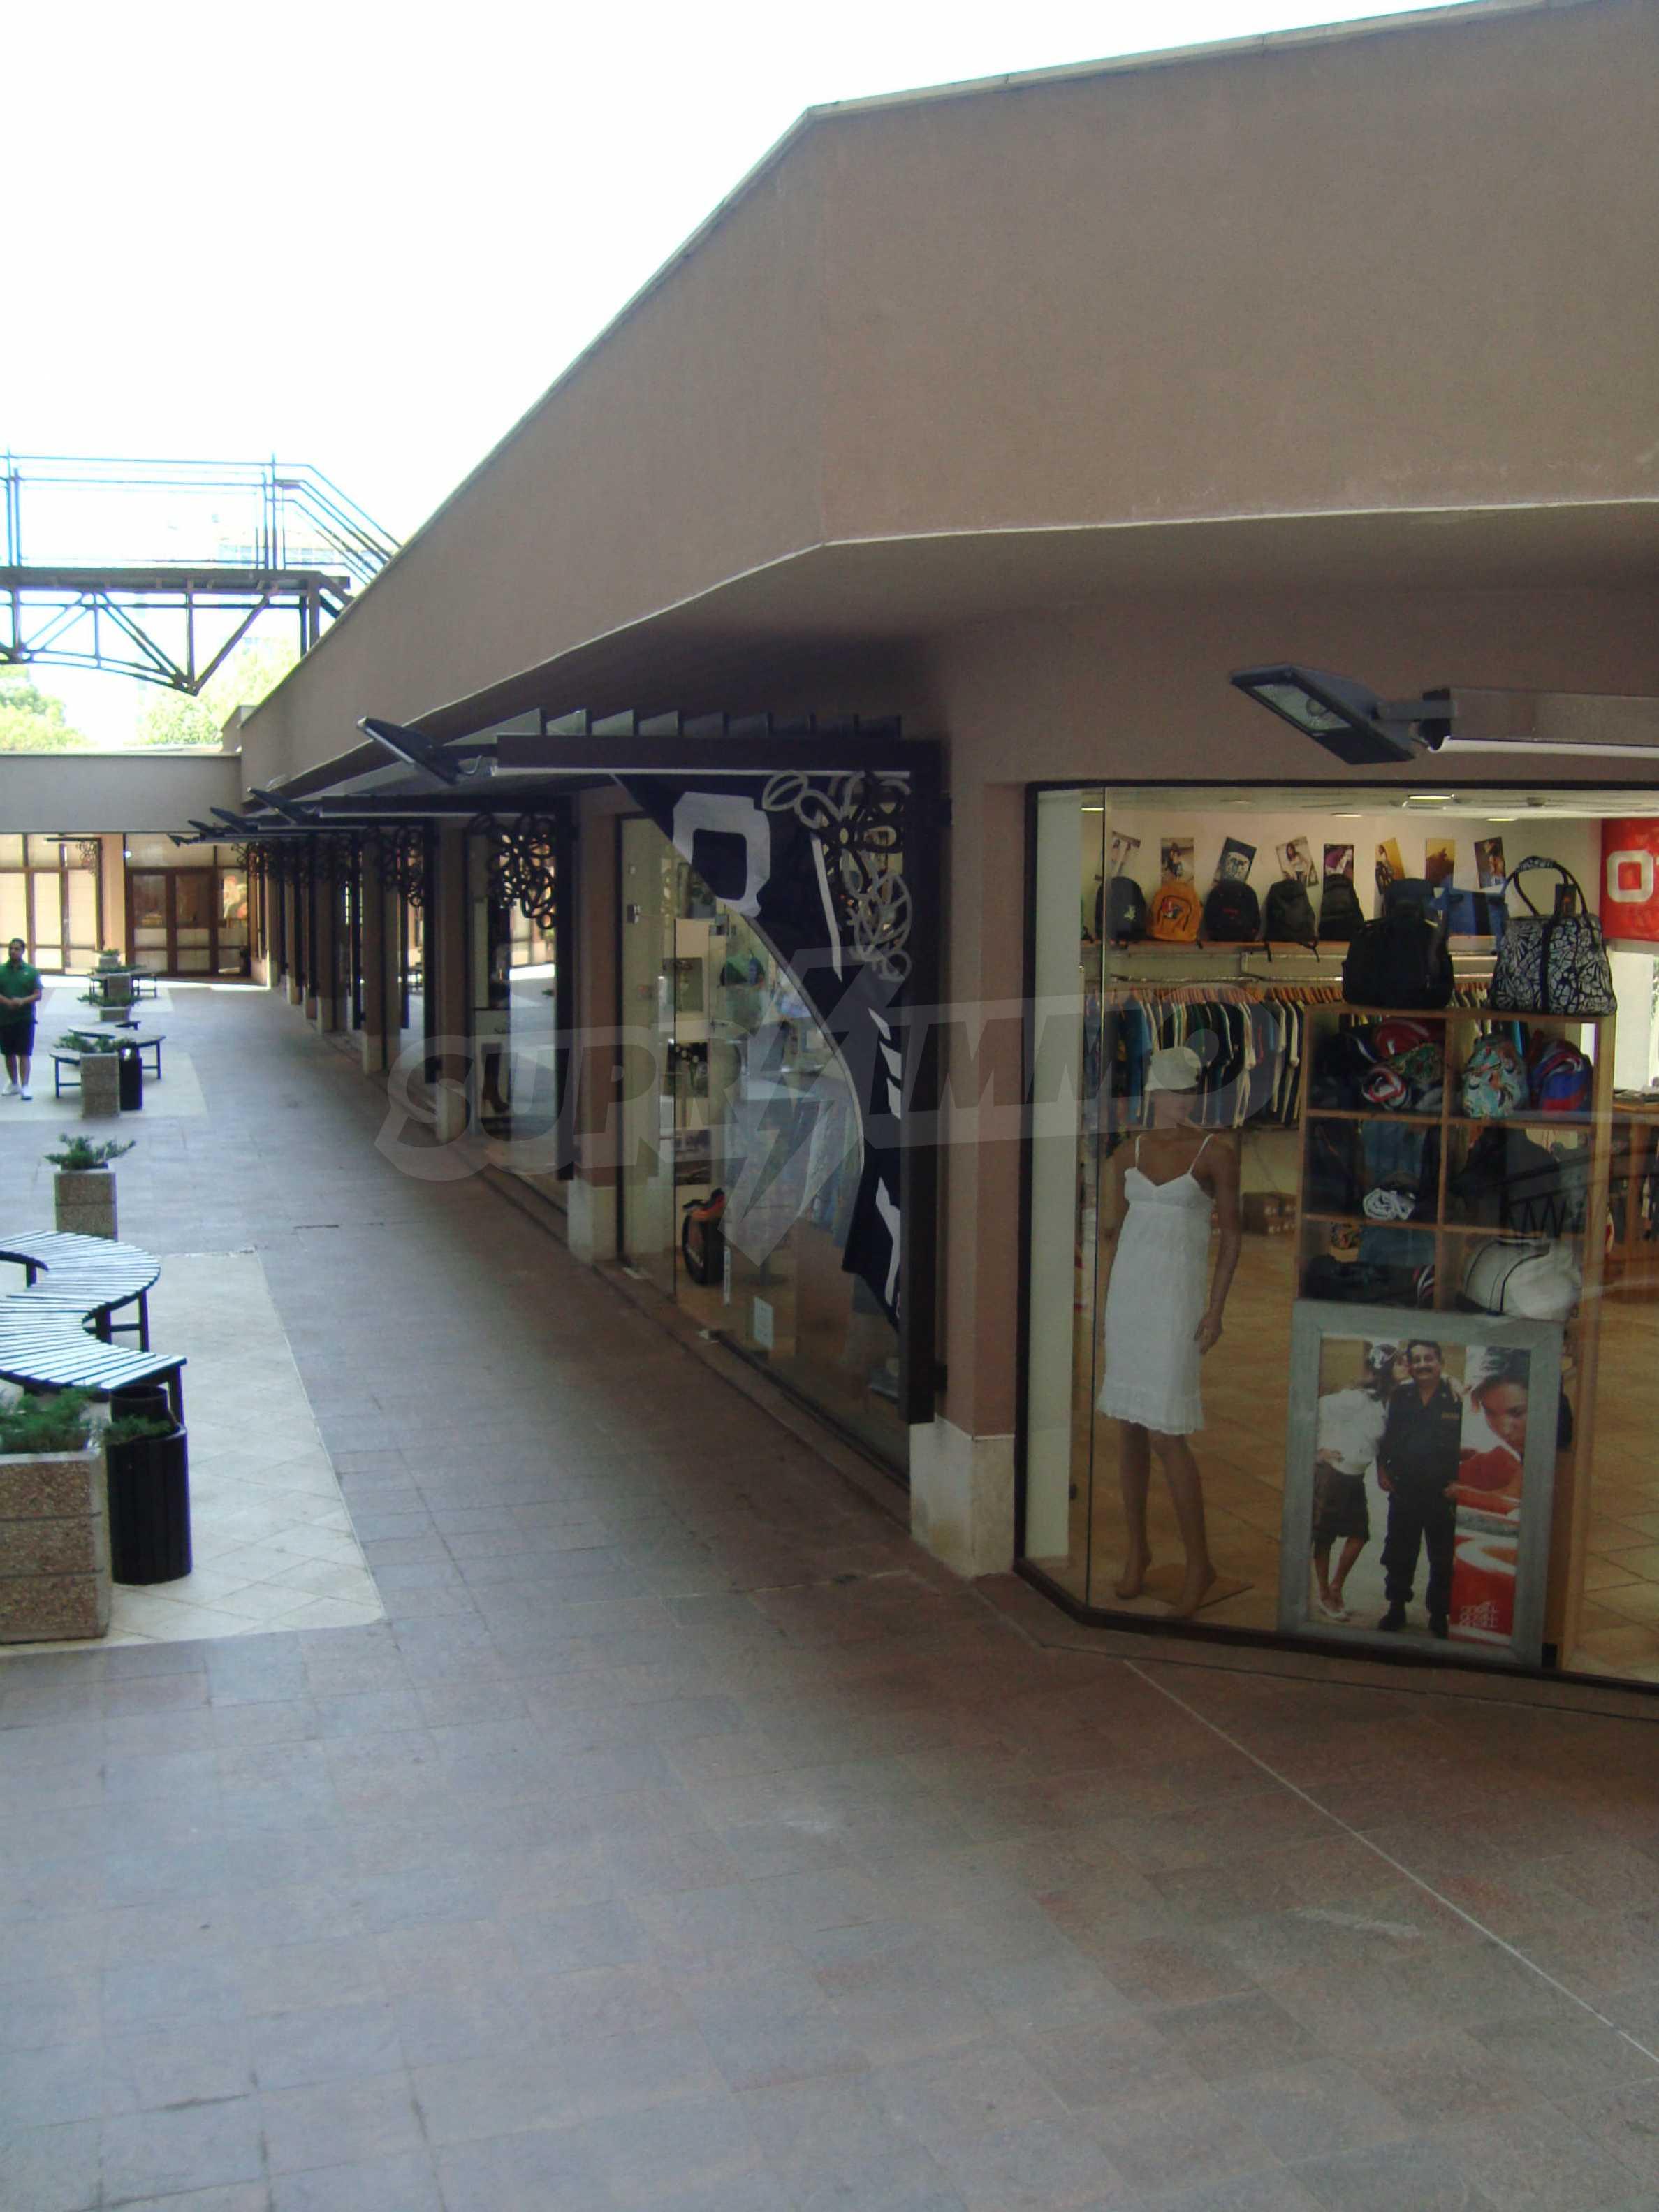 Studio for sale in Royal Baech Barcelo in Sunny Beach 22